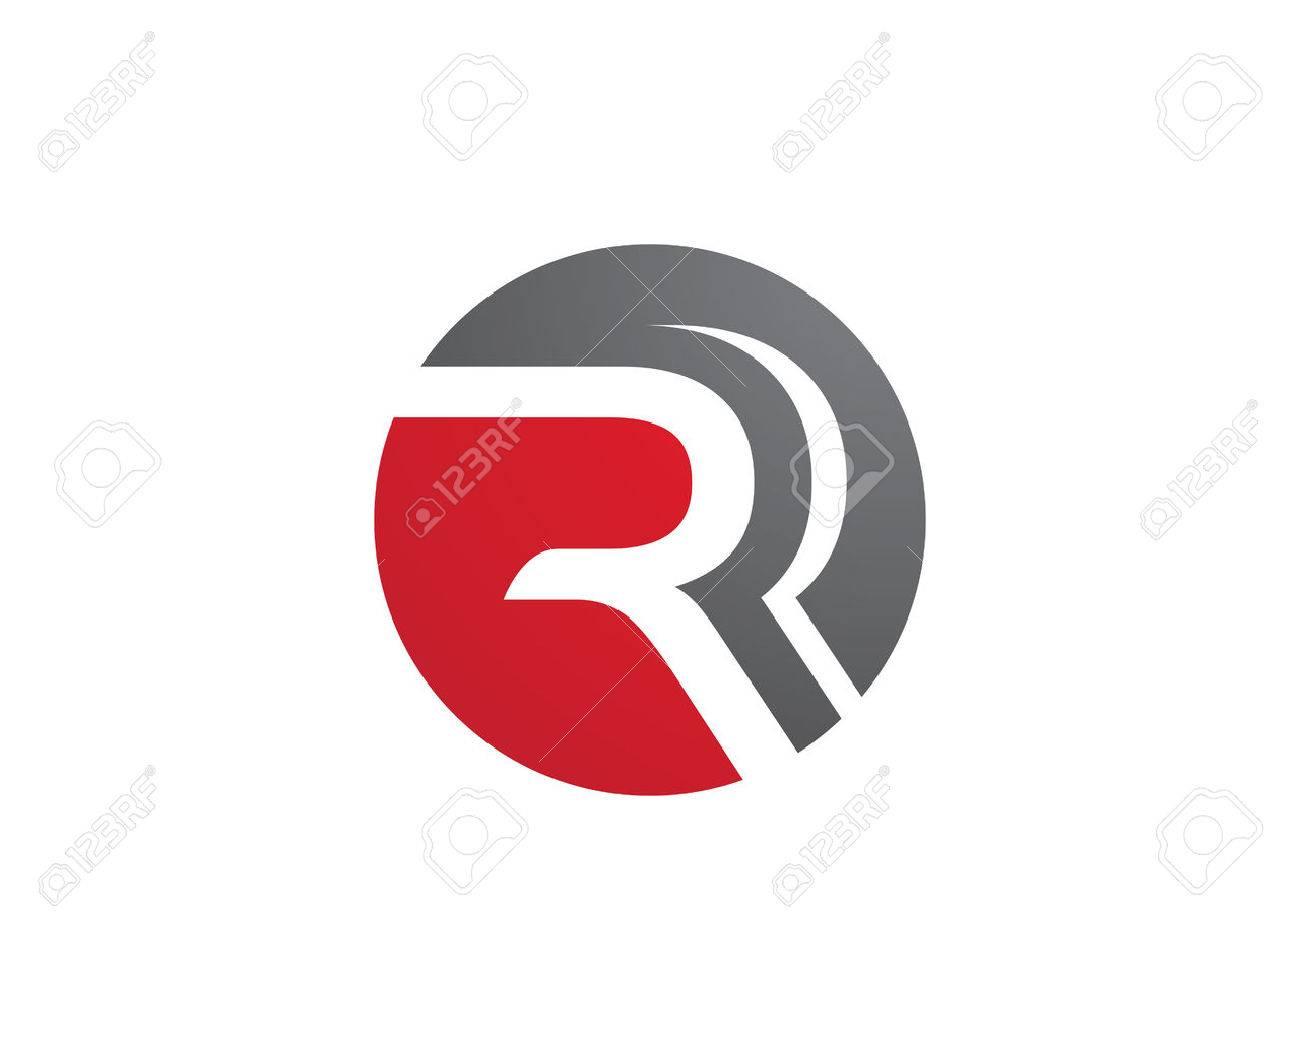 R letter logo business professional logo template royalty free r letter logo business professional logo template stock vector 71035341 altavistaventures Image collections